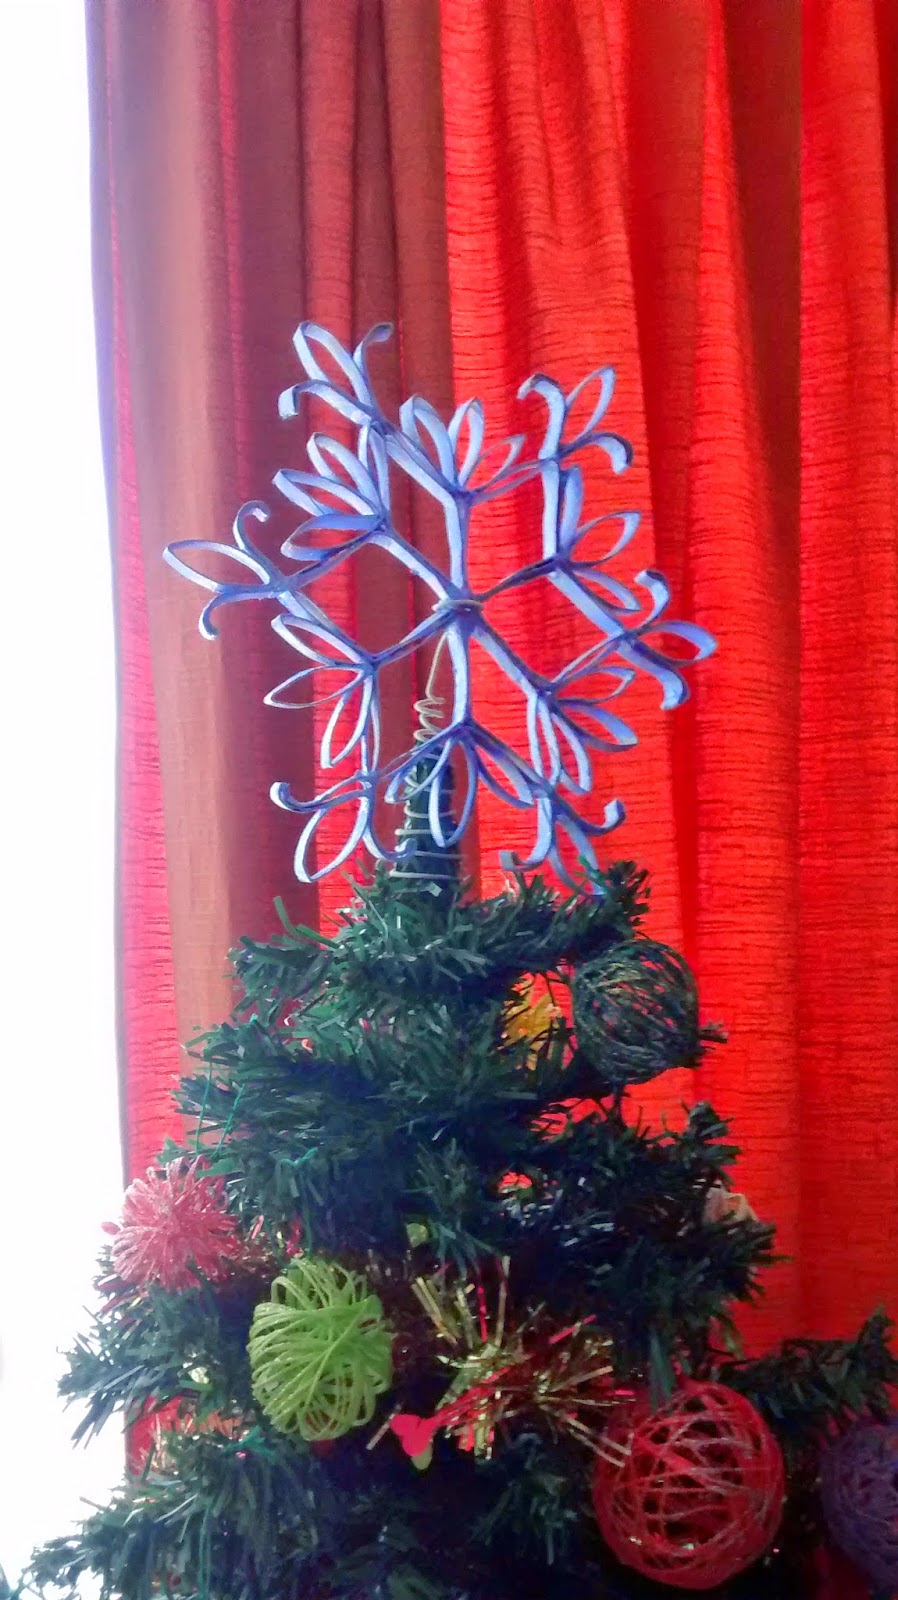 estrella arbol navidad artesanal